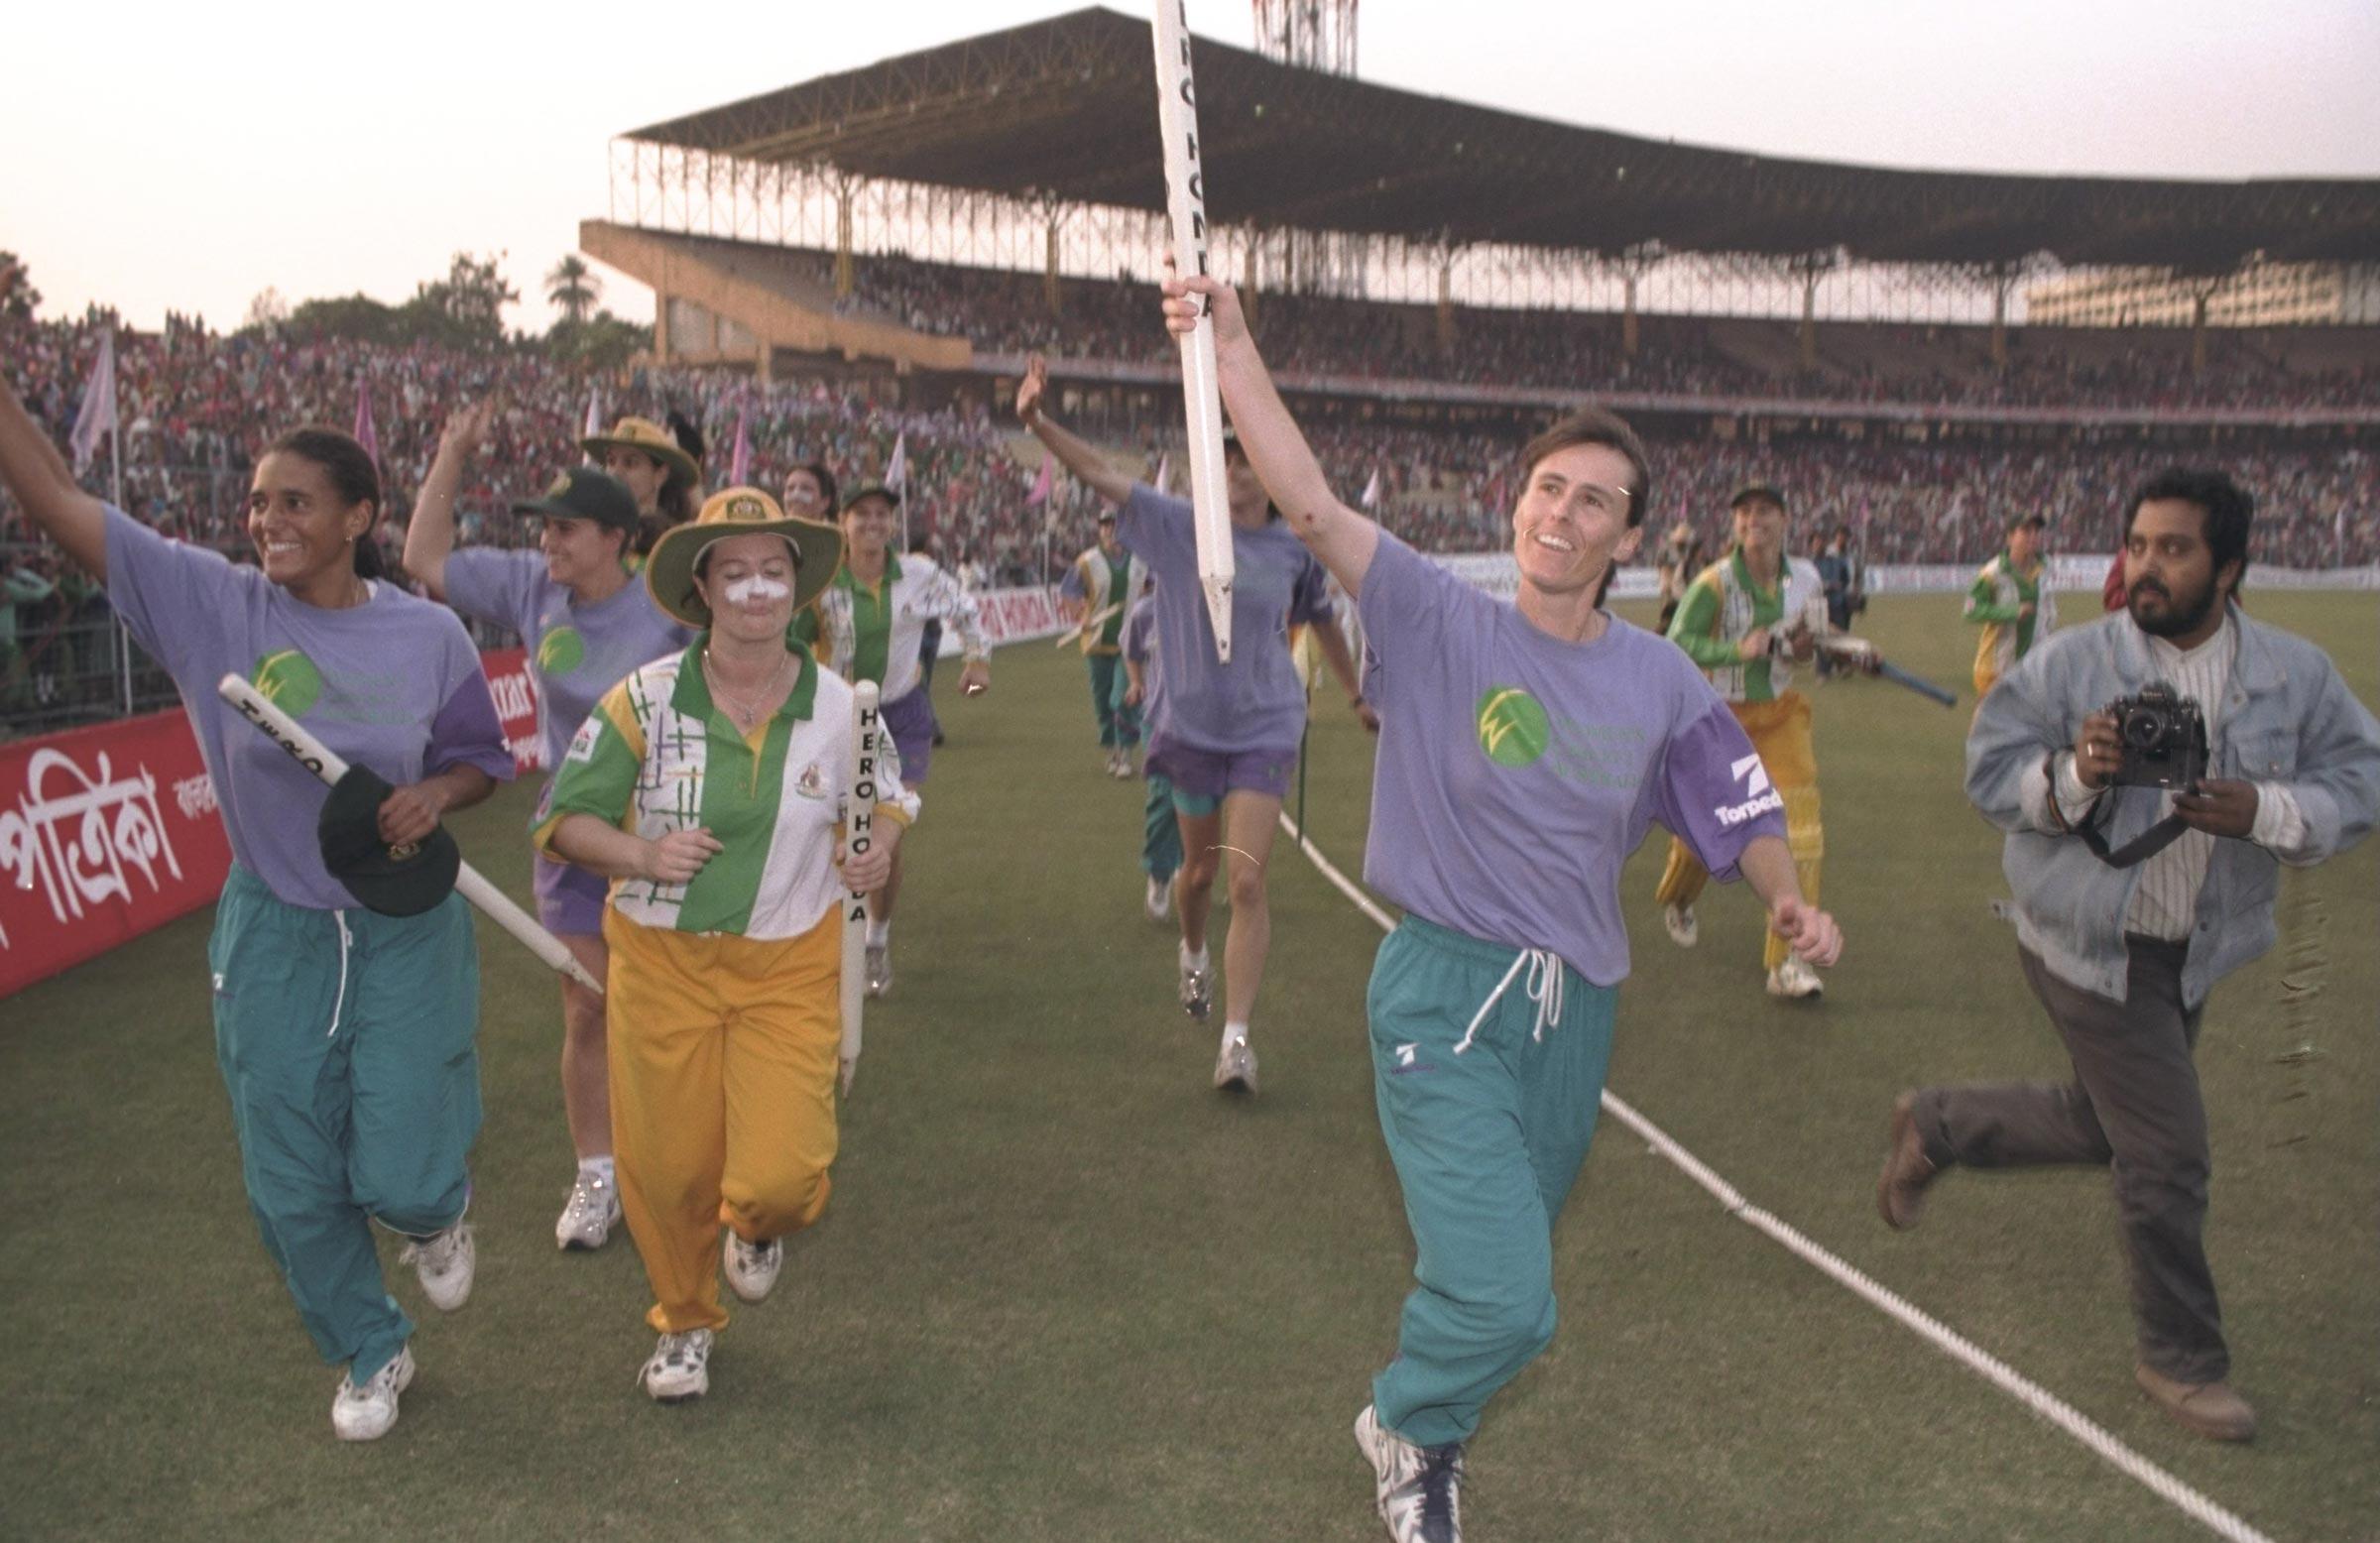 Australia celebrate winning the 1997 World Cup at Kolkata's Eden Gardens // Getty